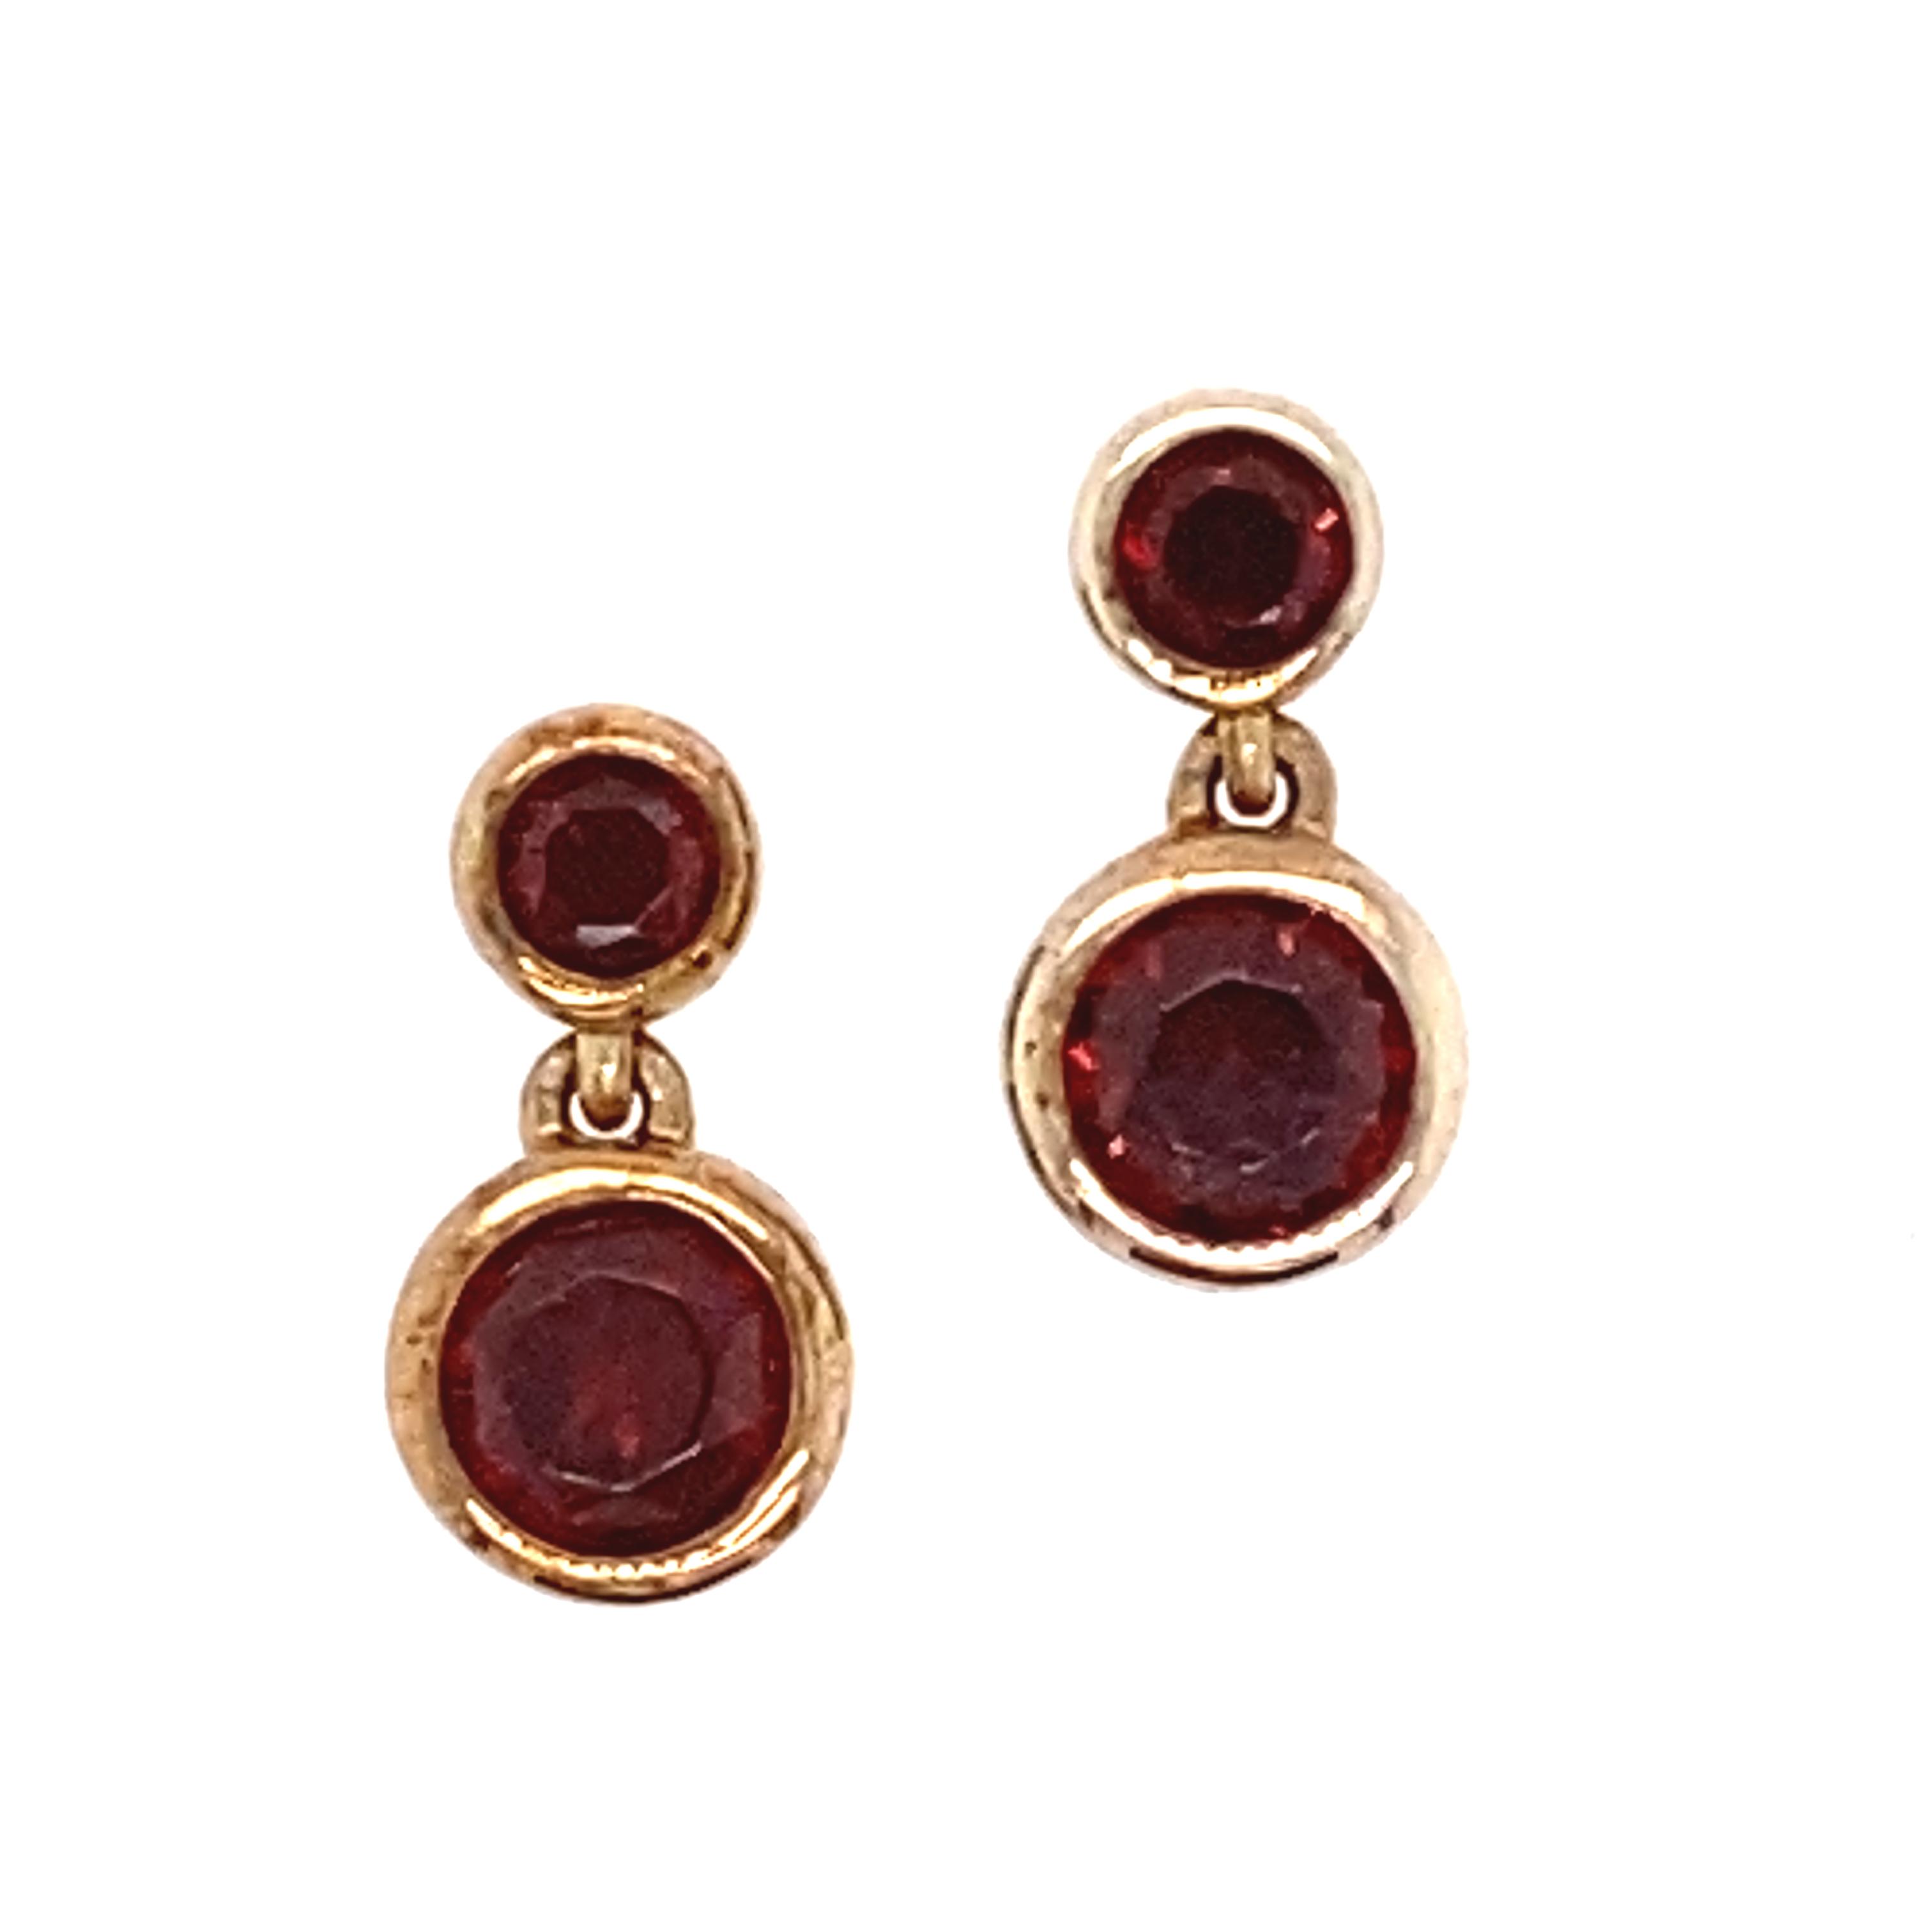 9 Carat Yellow Gold and Garnet Drop Earrings